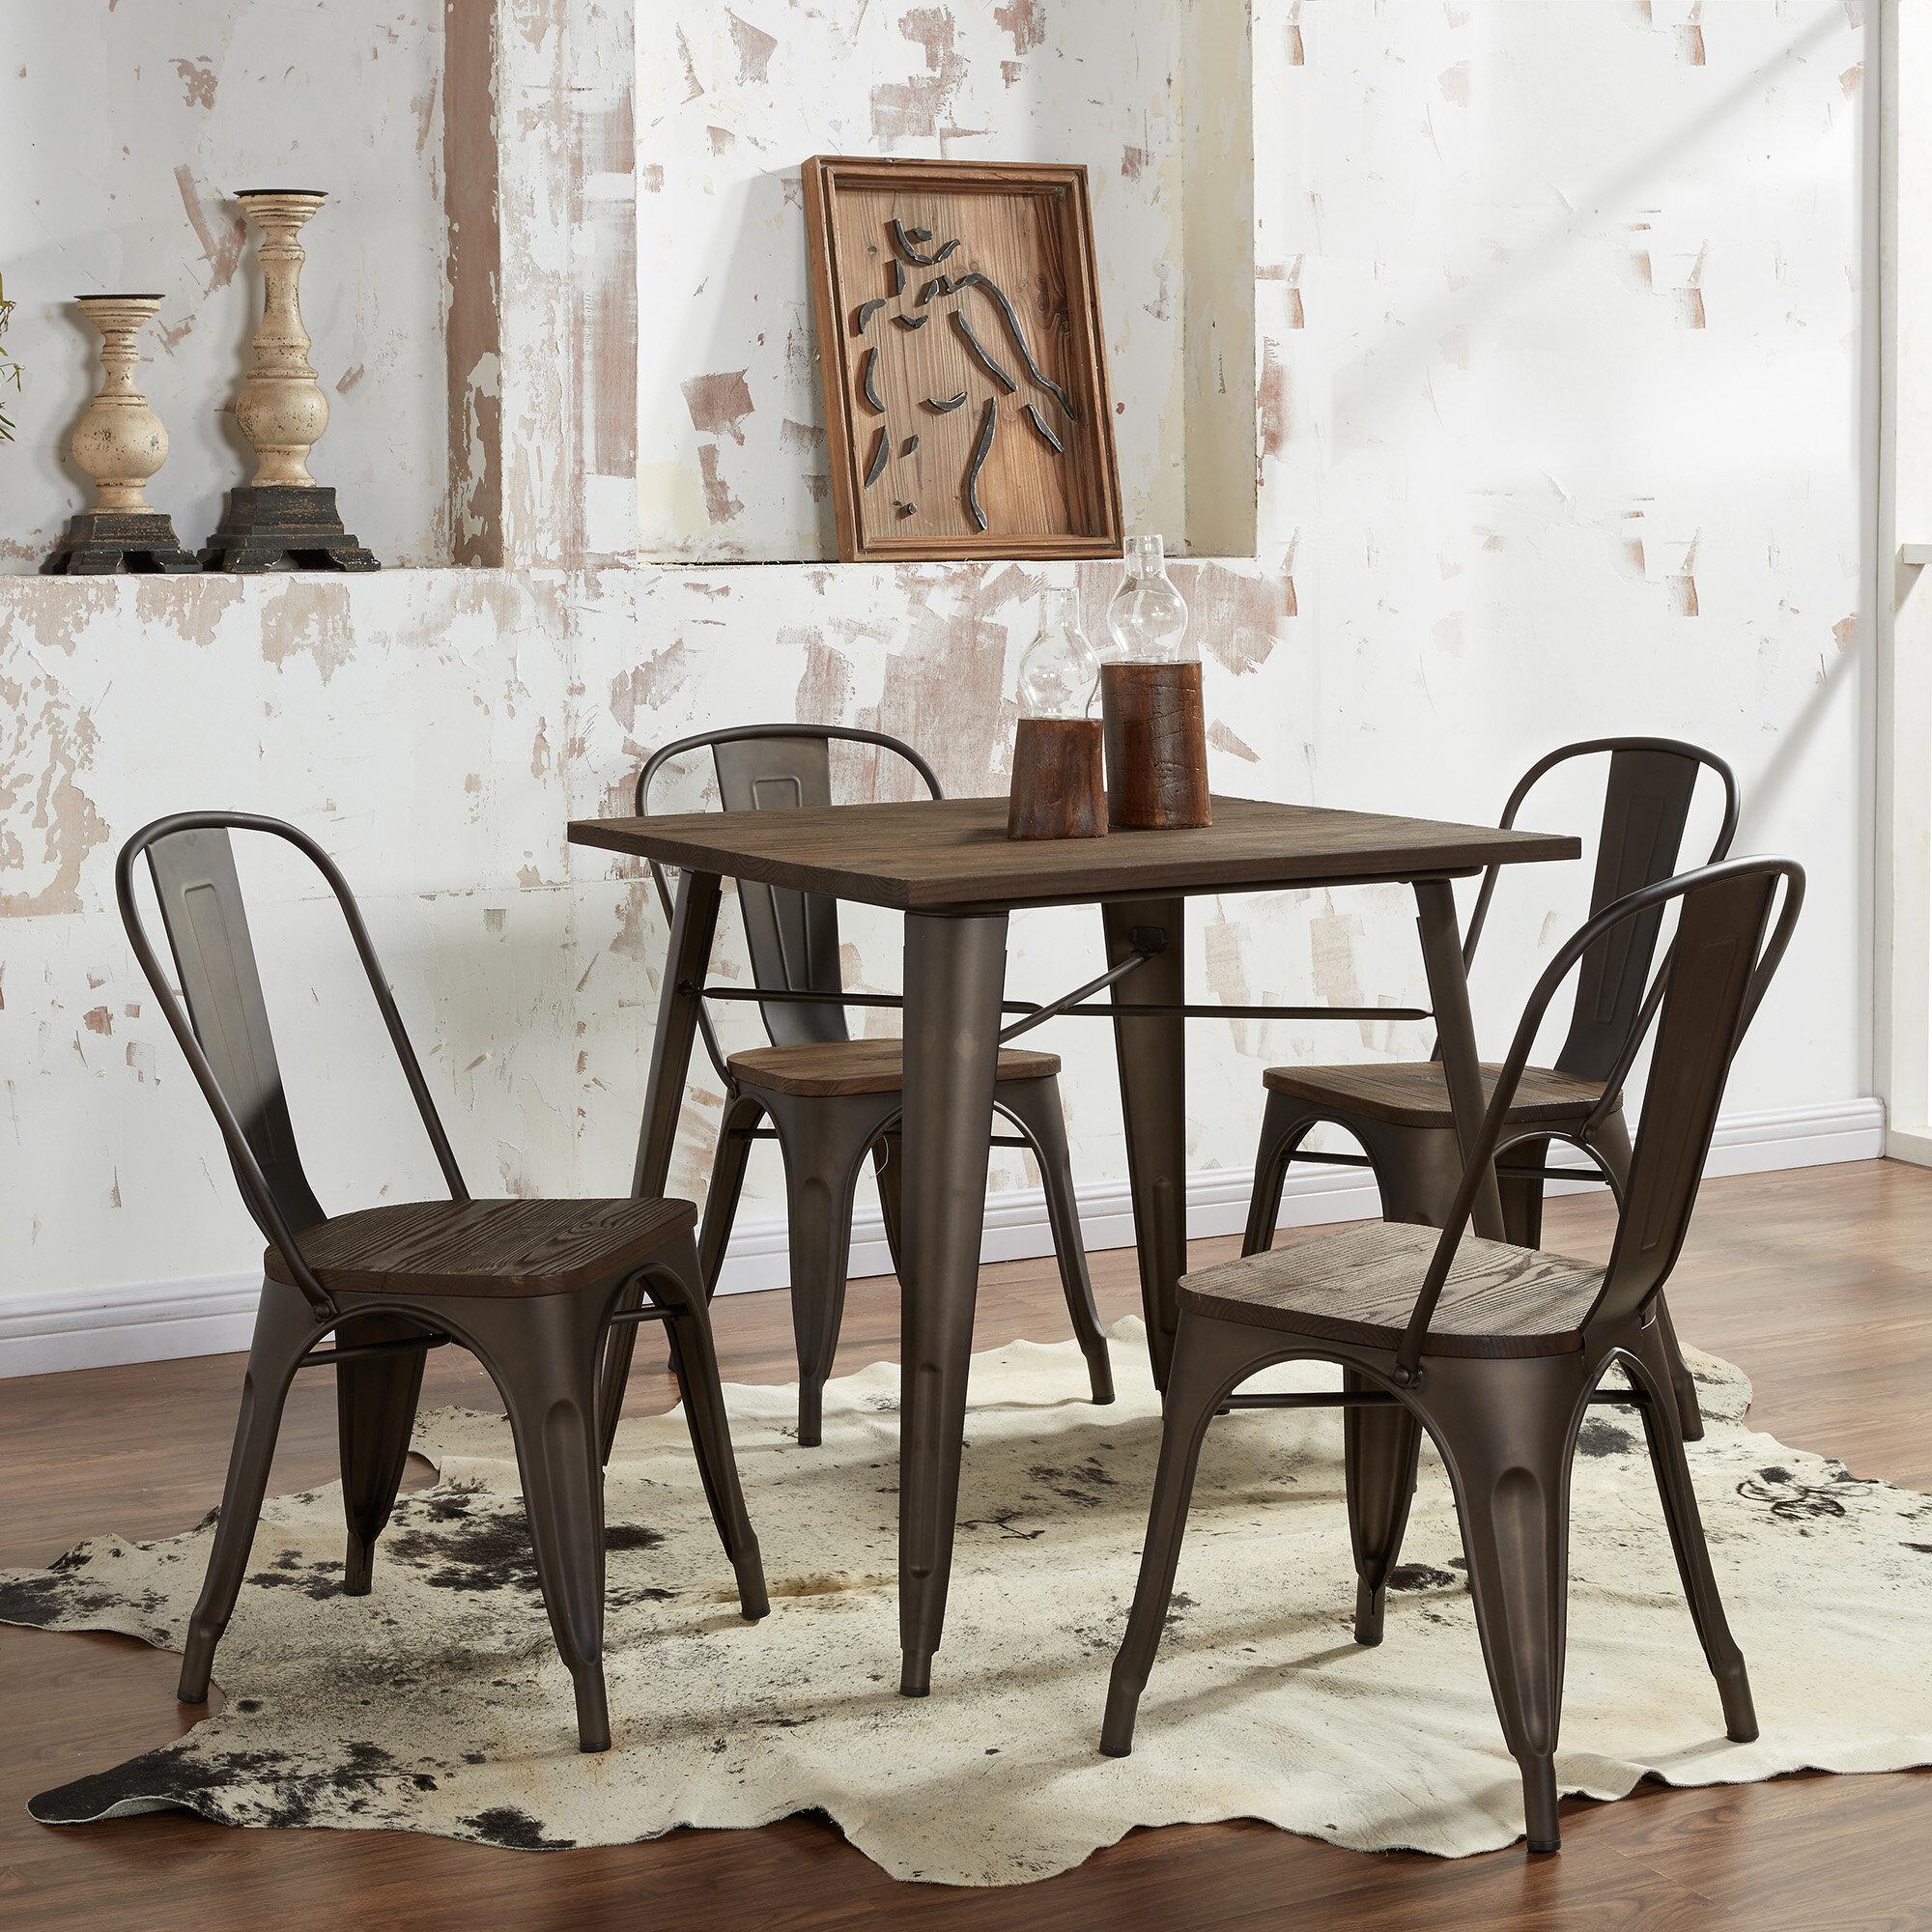 5 piece industrial dining set